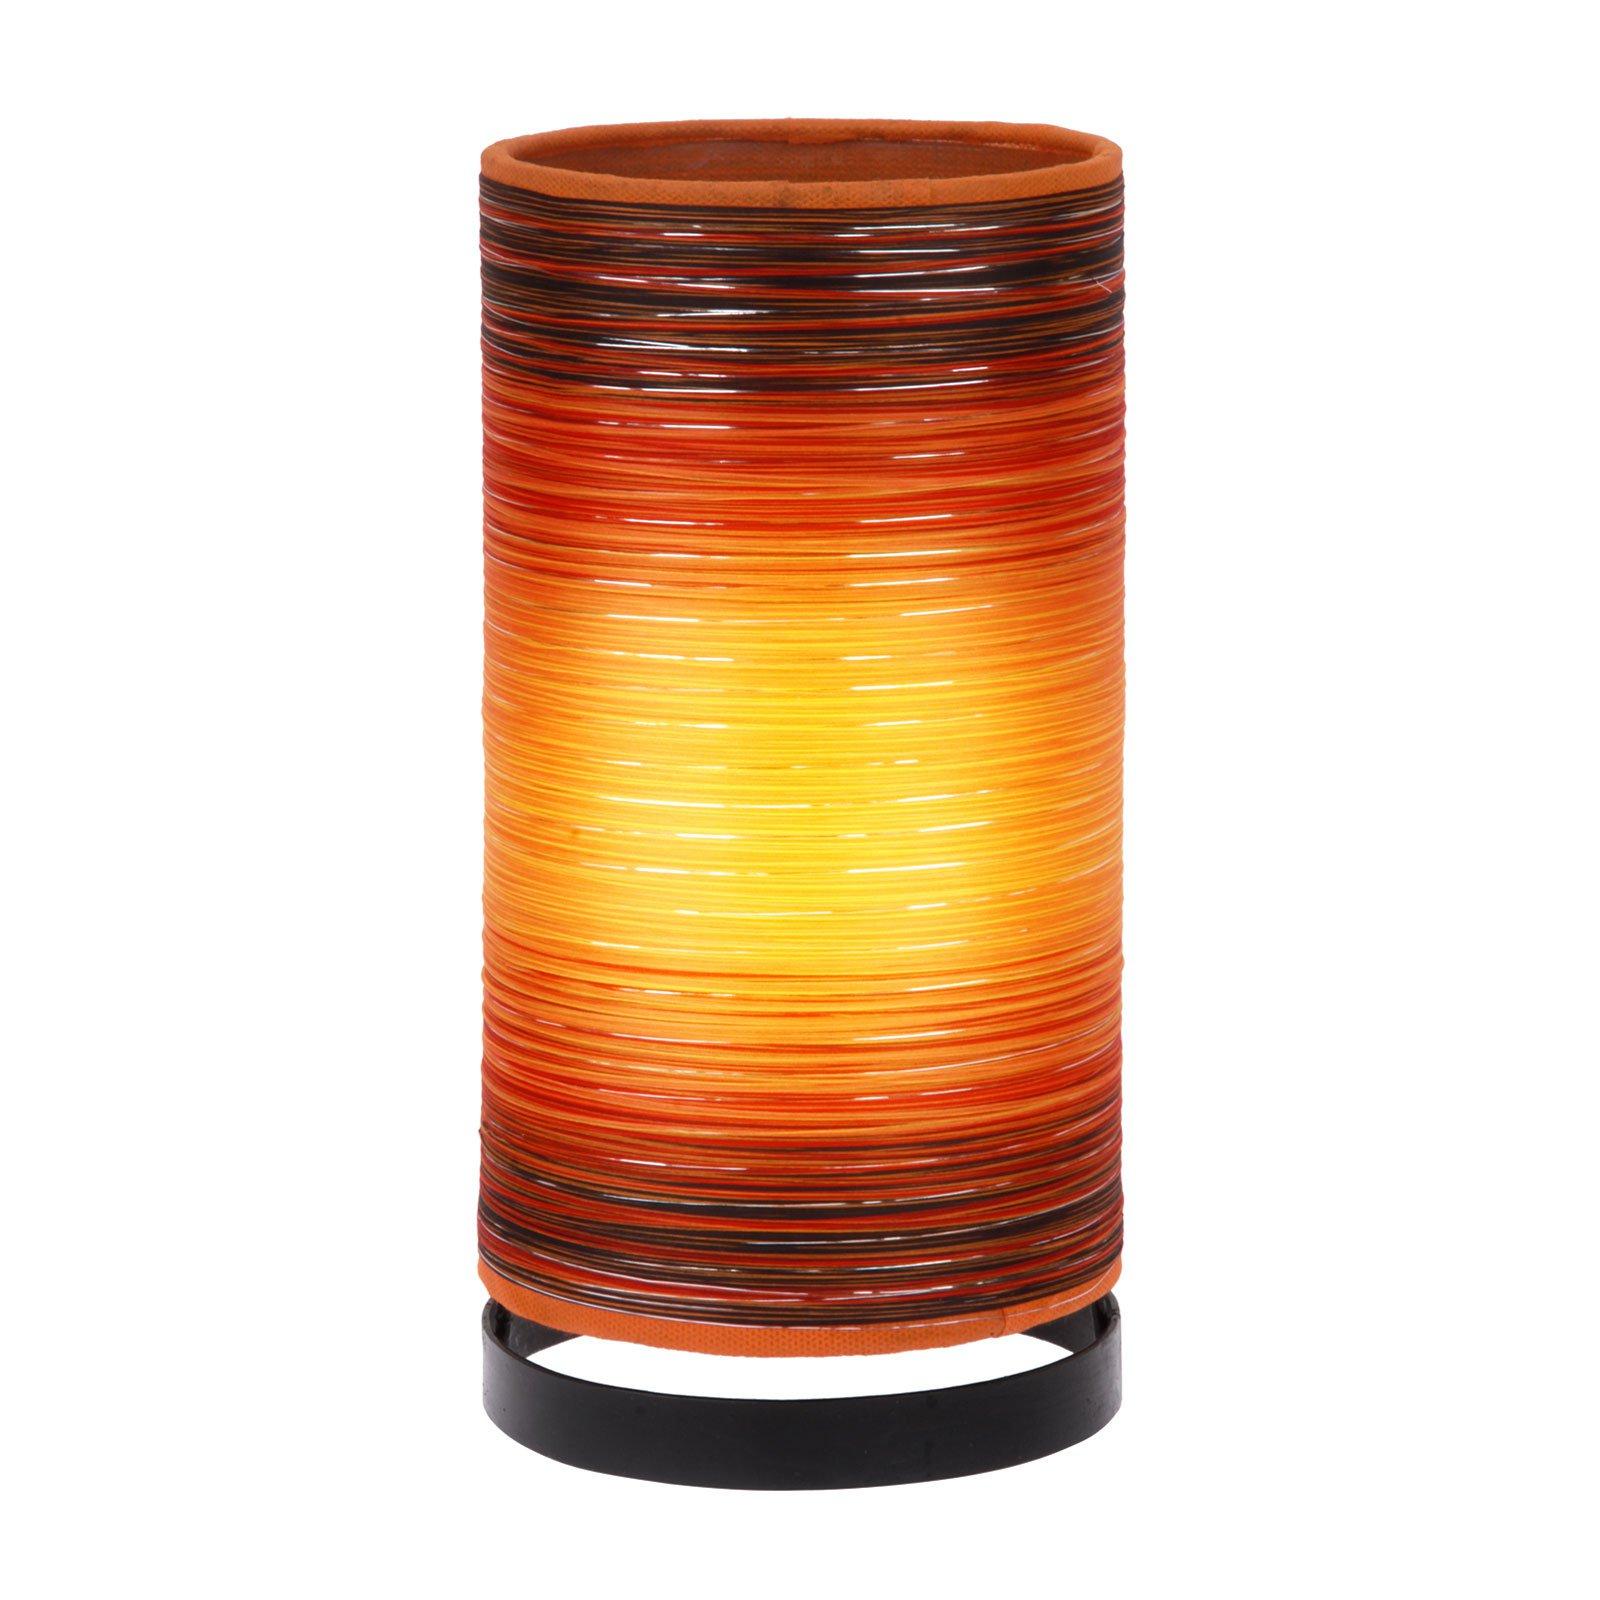 Bordlampe Julie viklet inn med tråder, oransje